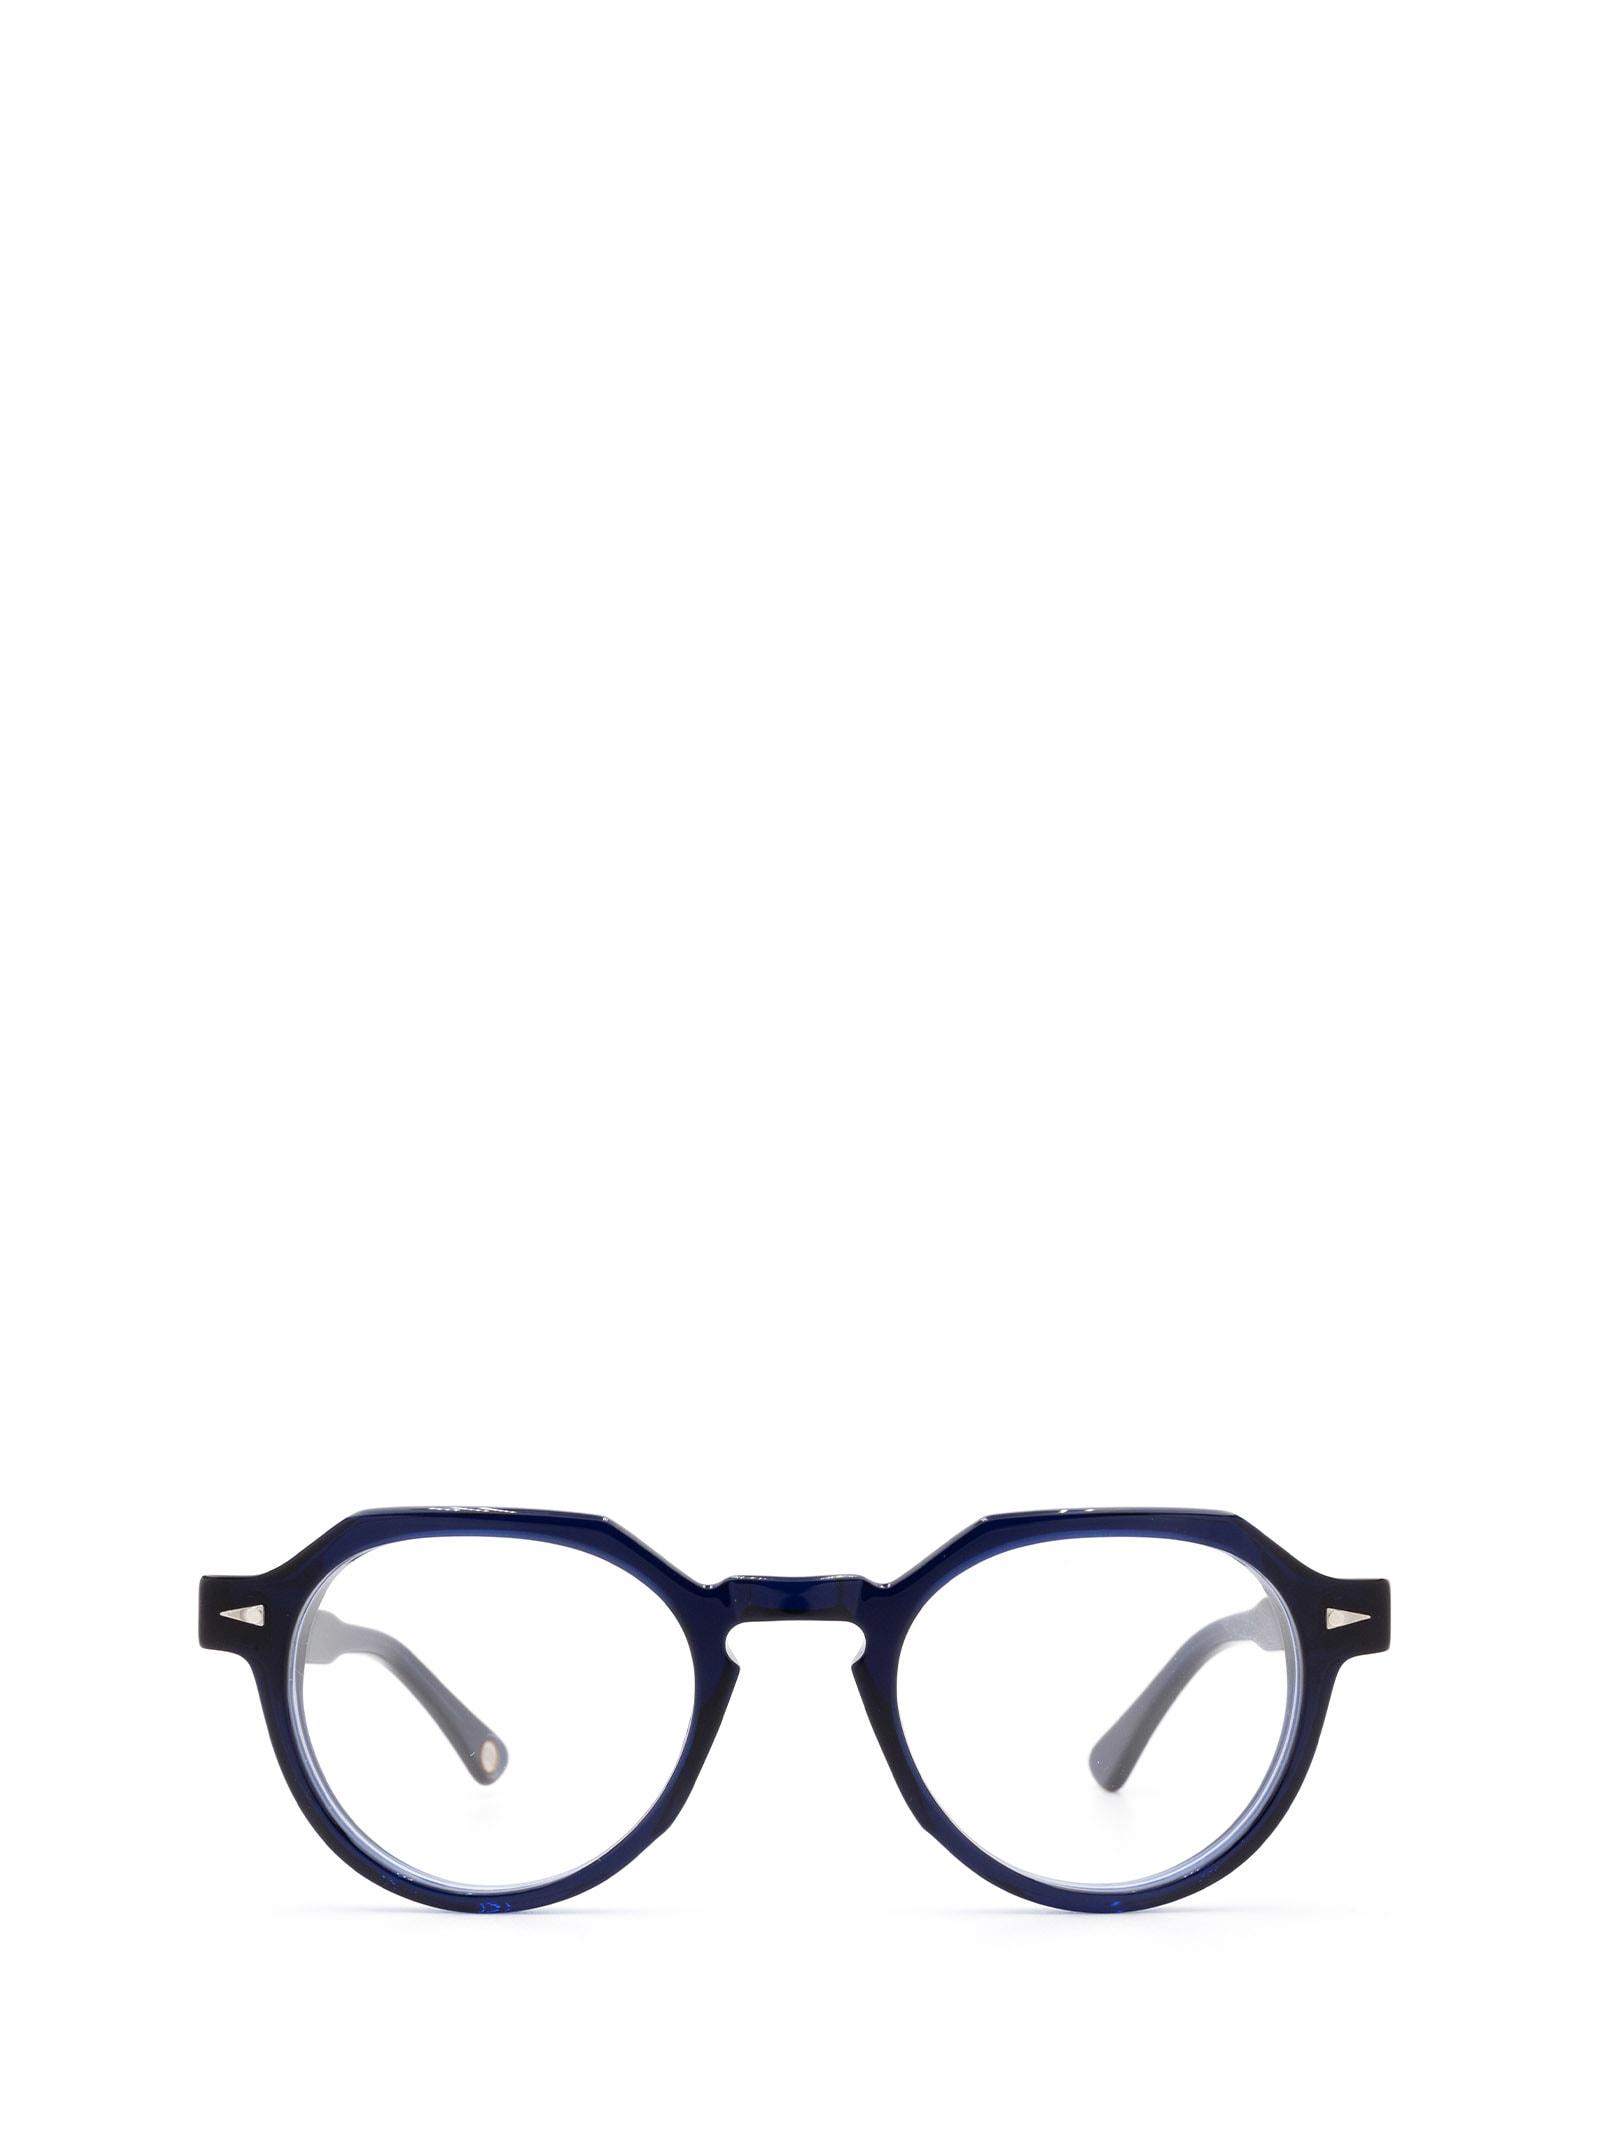 AHLEM Ahlem Rue Bosquet Bluelight Glasses